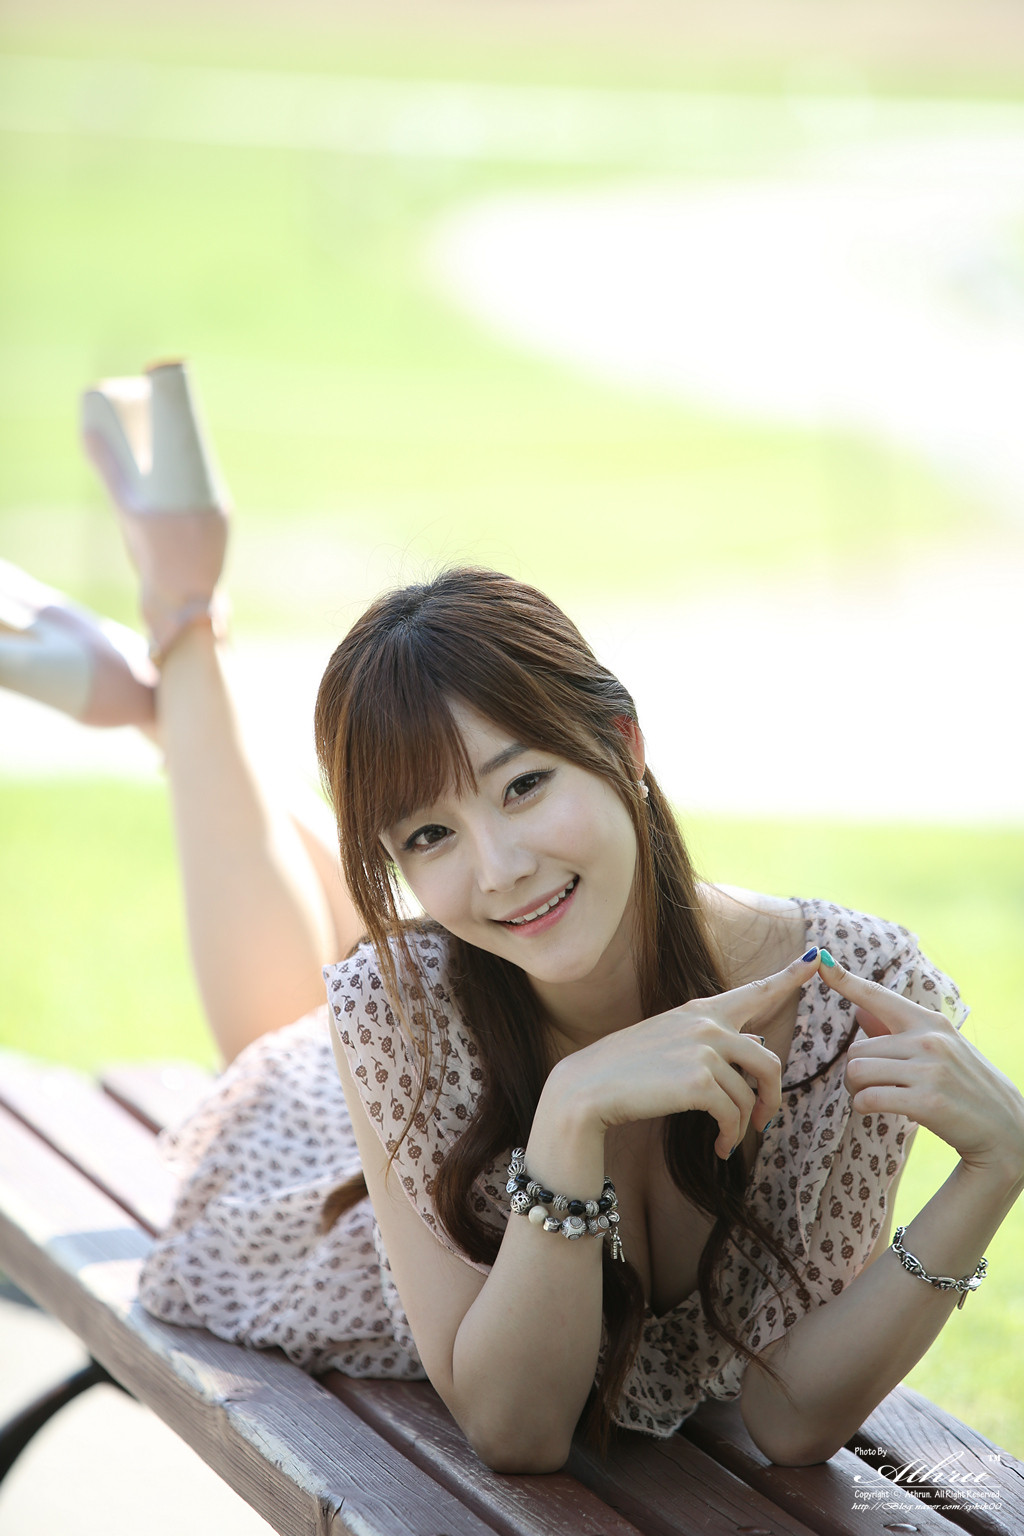 [Choi Seul Ki Part.2] 2013.05.23